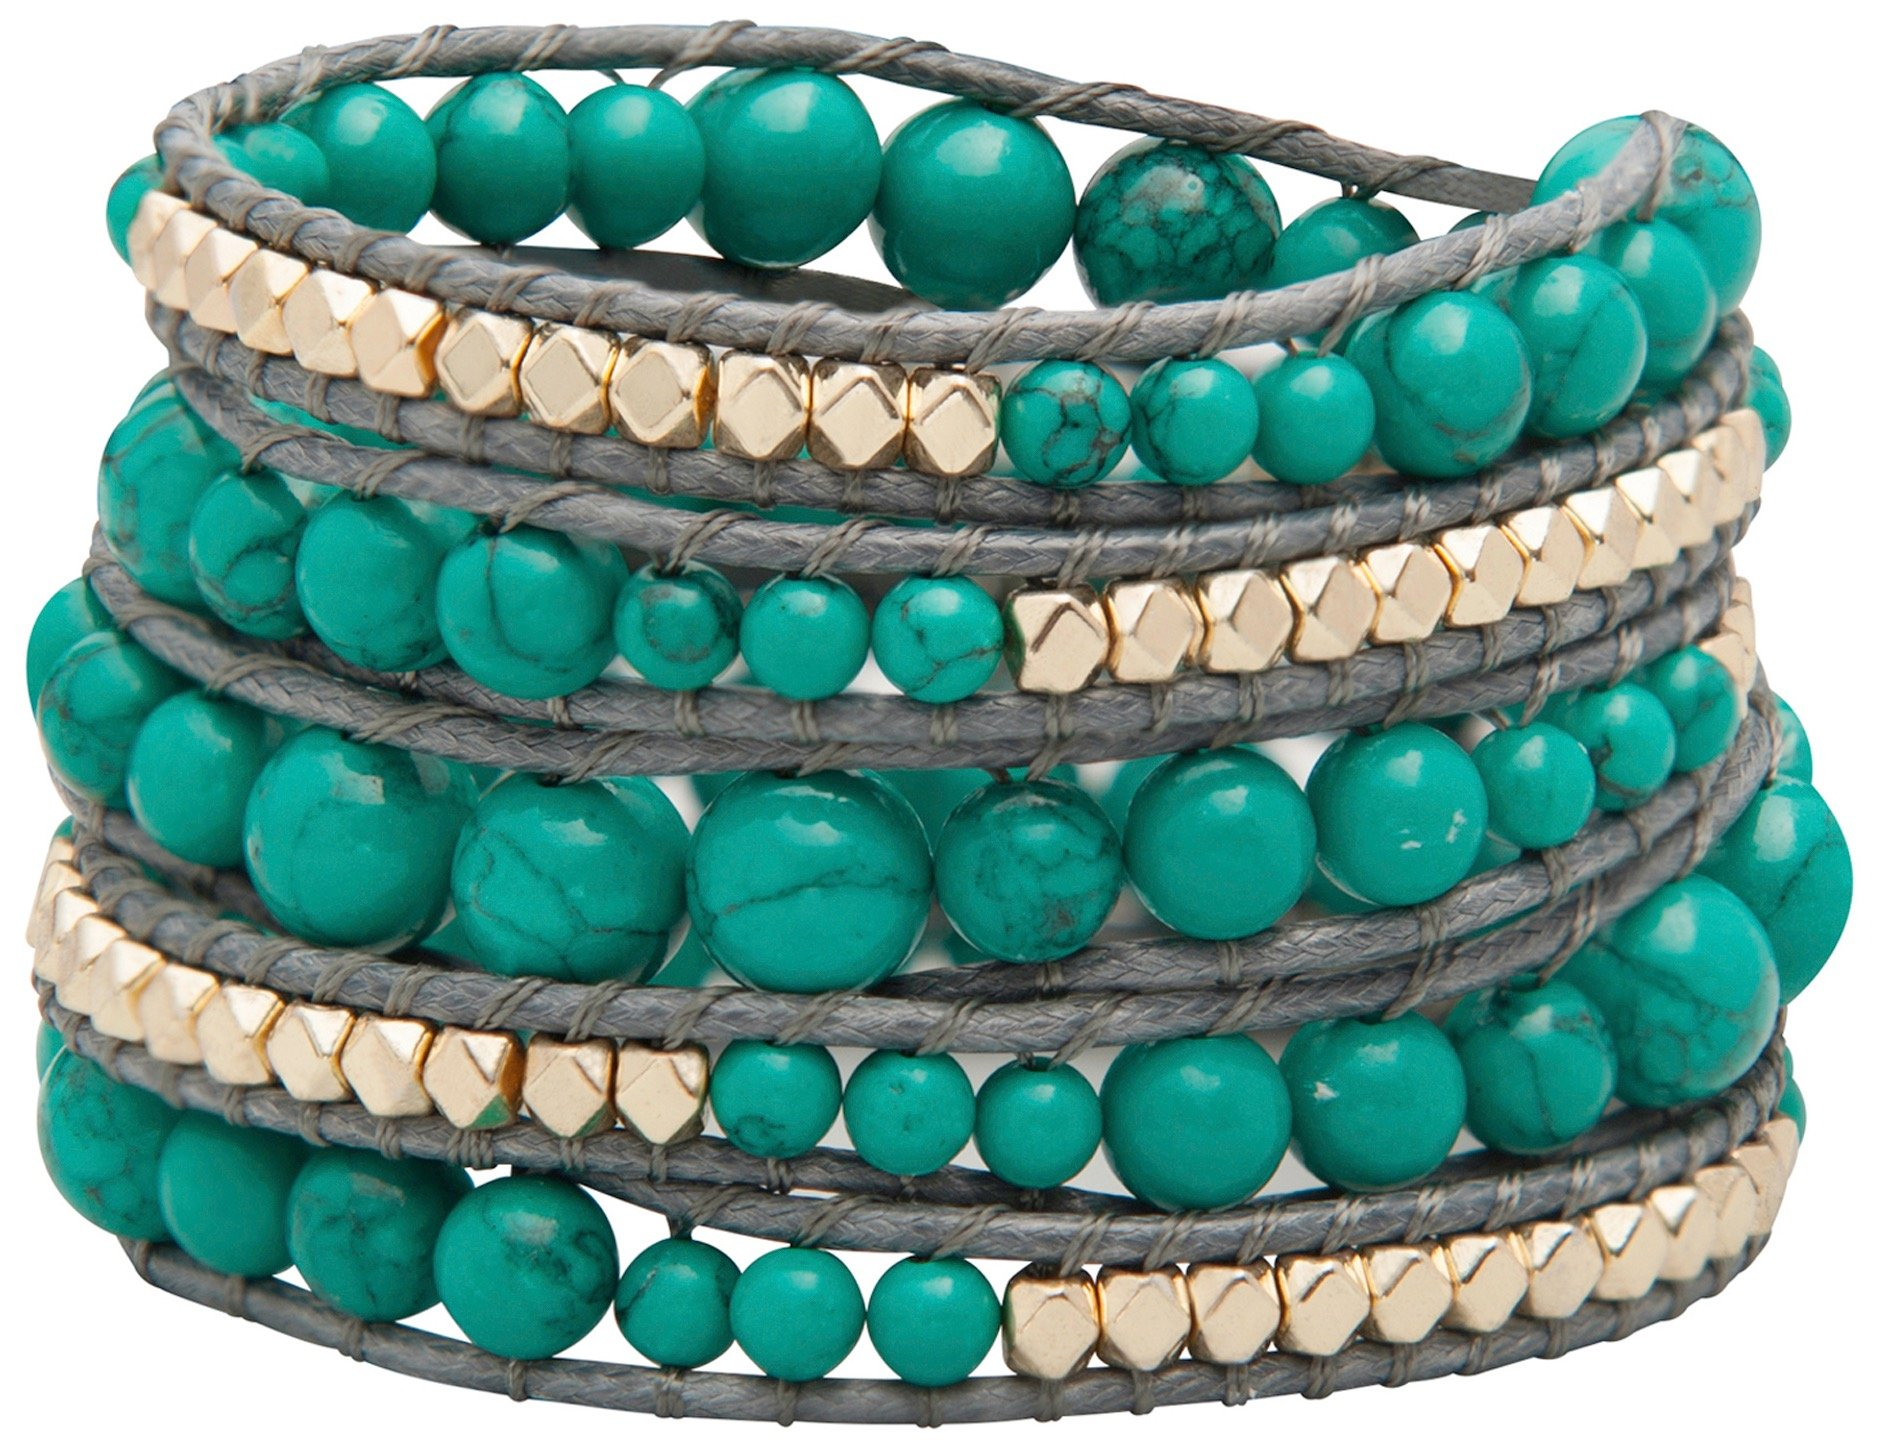 Genuine Stones 5 Wrap Bracelet - Bangle Cuff Rope With Beads - Unisex - Free Size Adjustable (Turquoise) by Sun Life Style (Image #1)